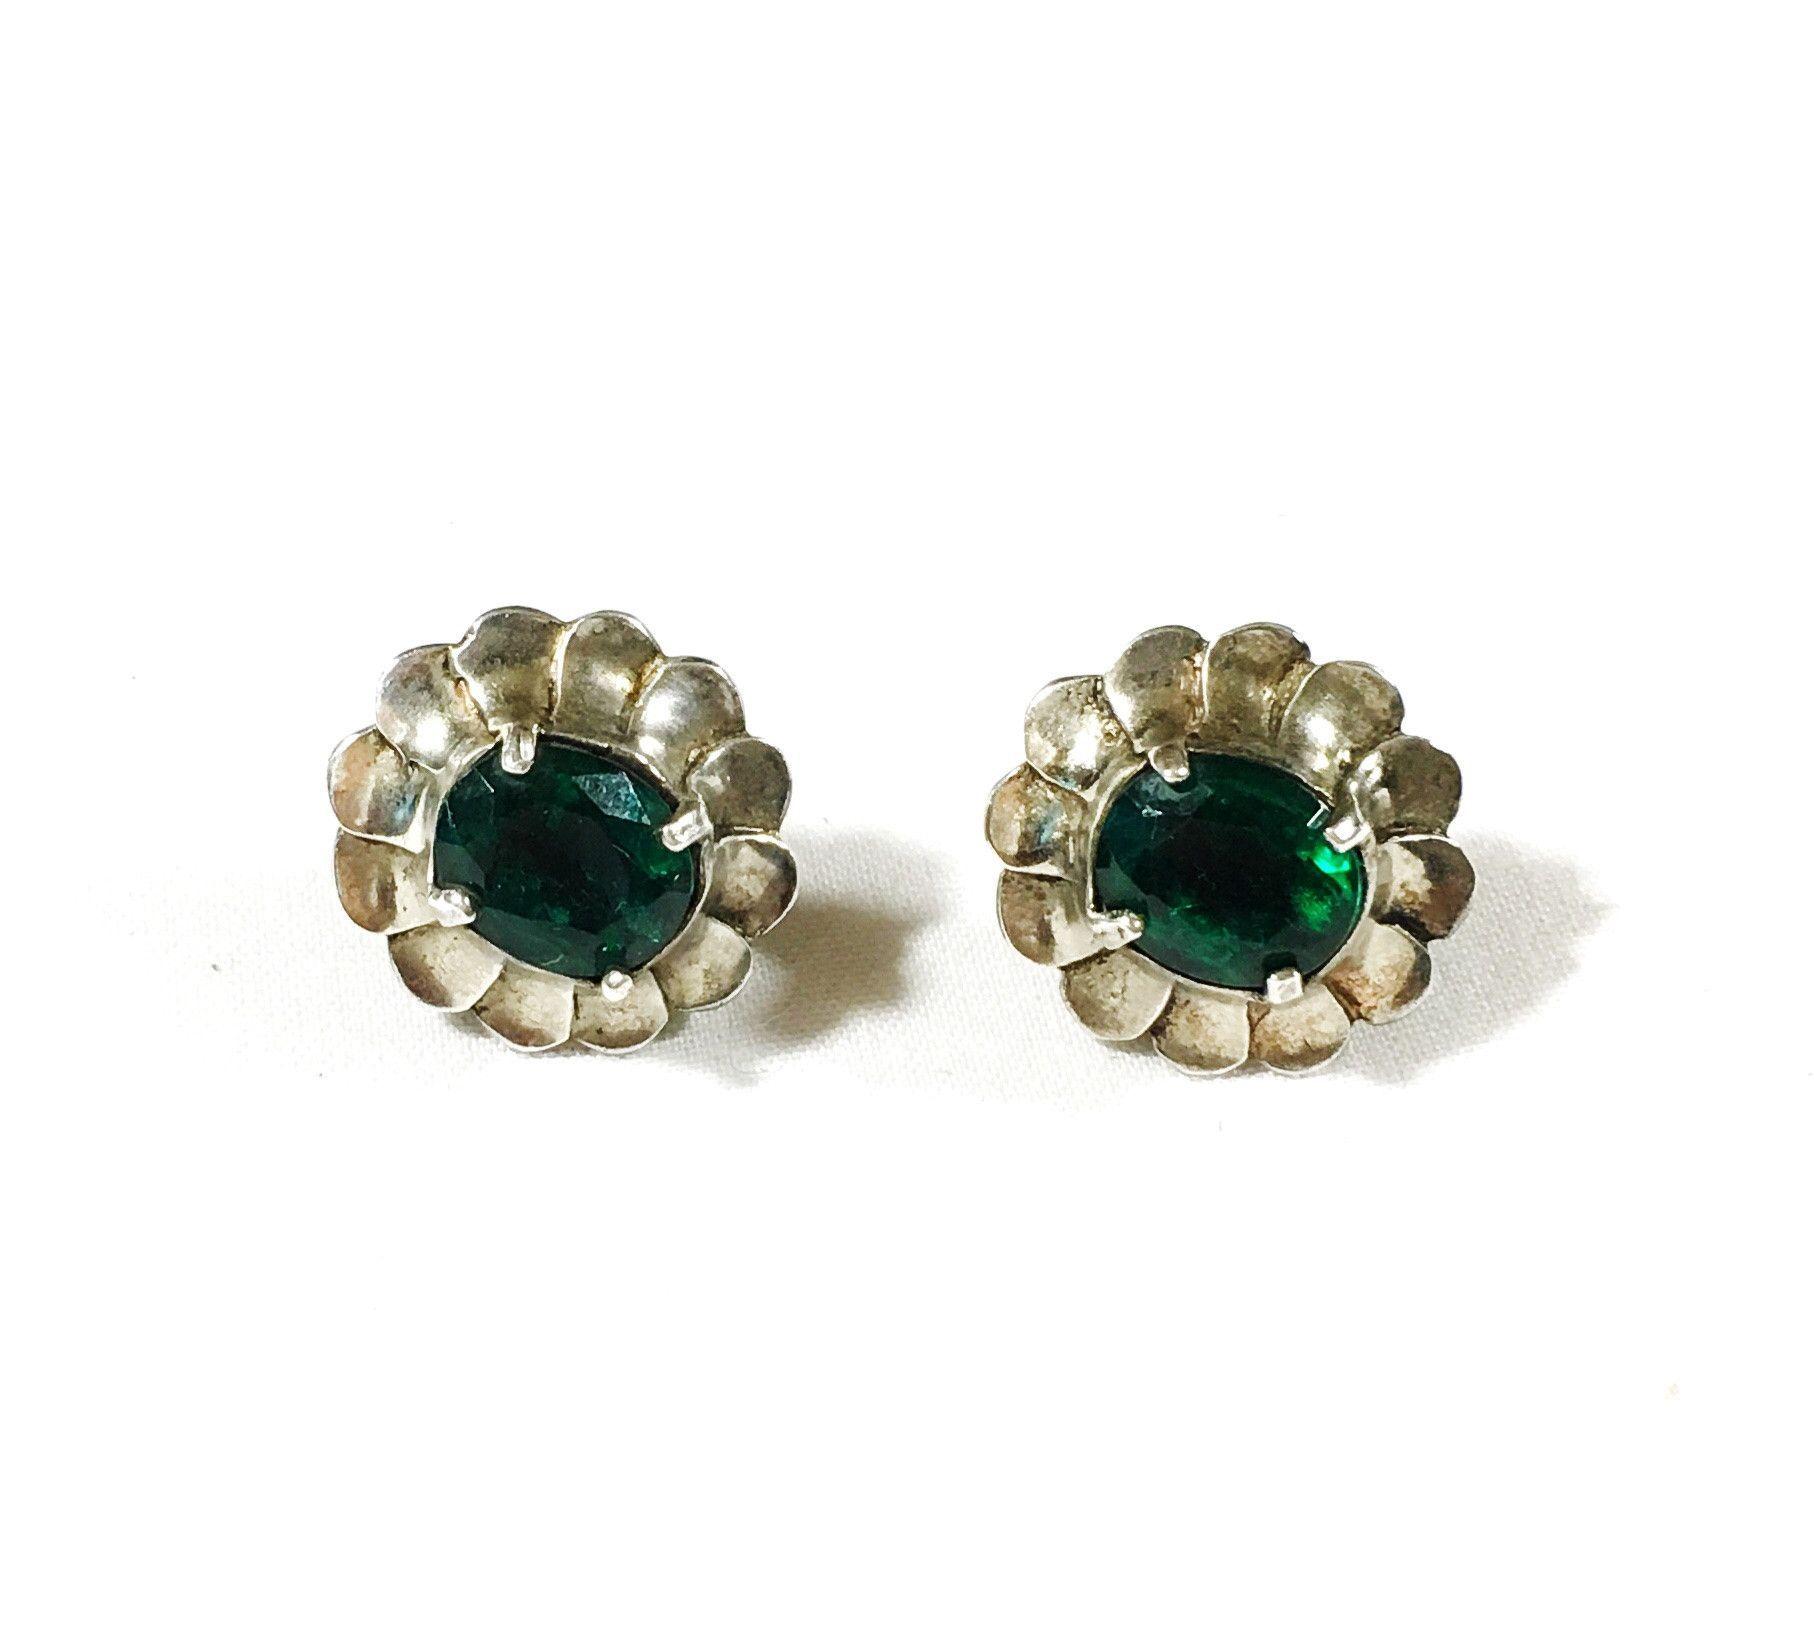 Vintage Sterling Silver Screw Back Earrings-Floral Design